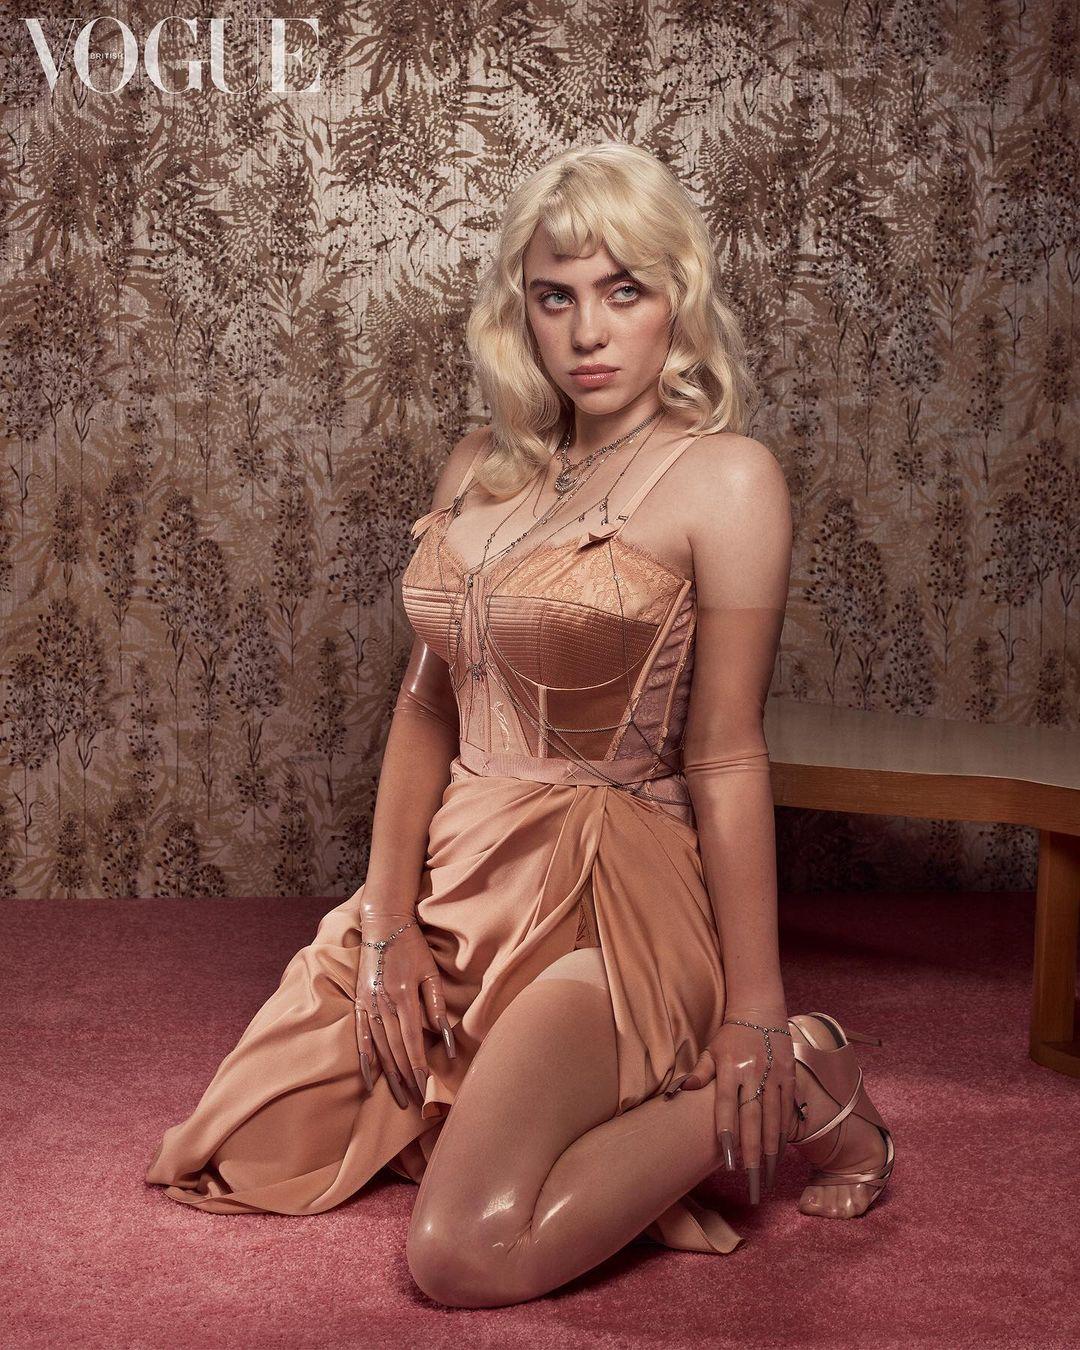 Billie Eilish Vogue Photo Shares Set Records 2